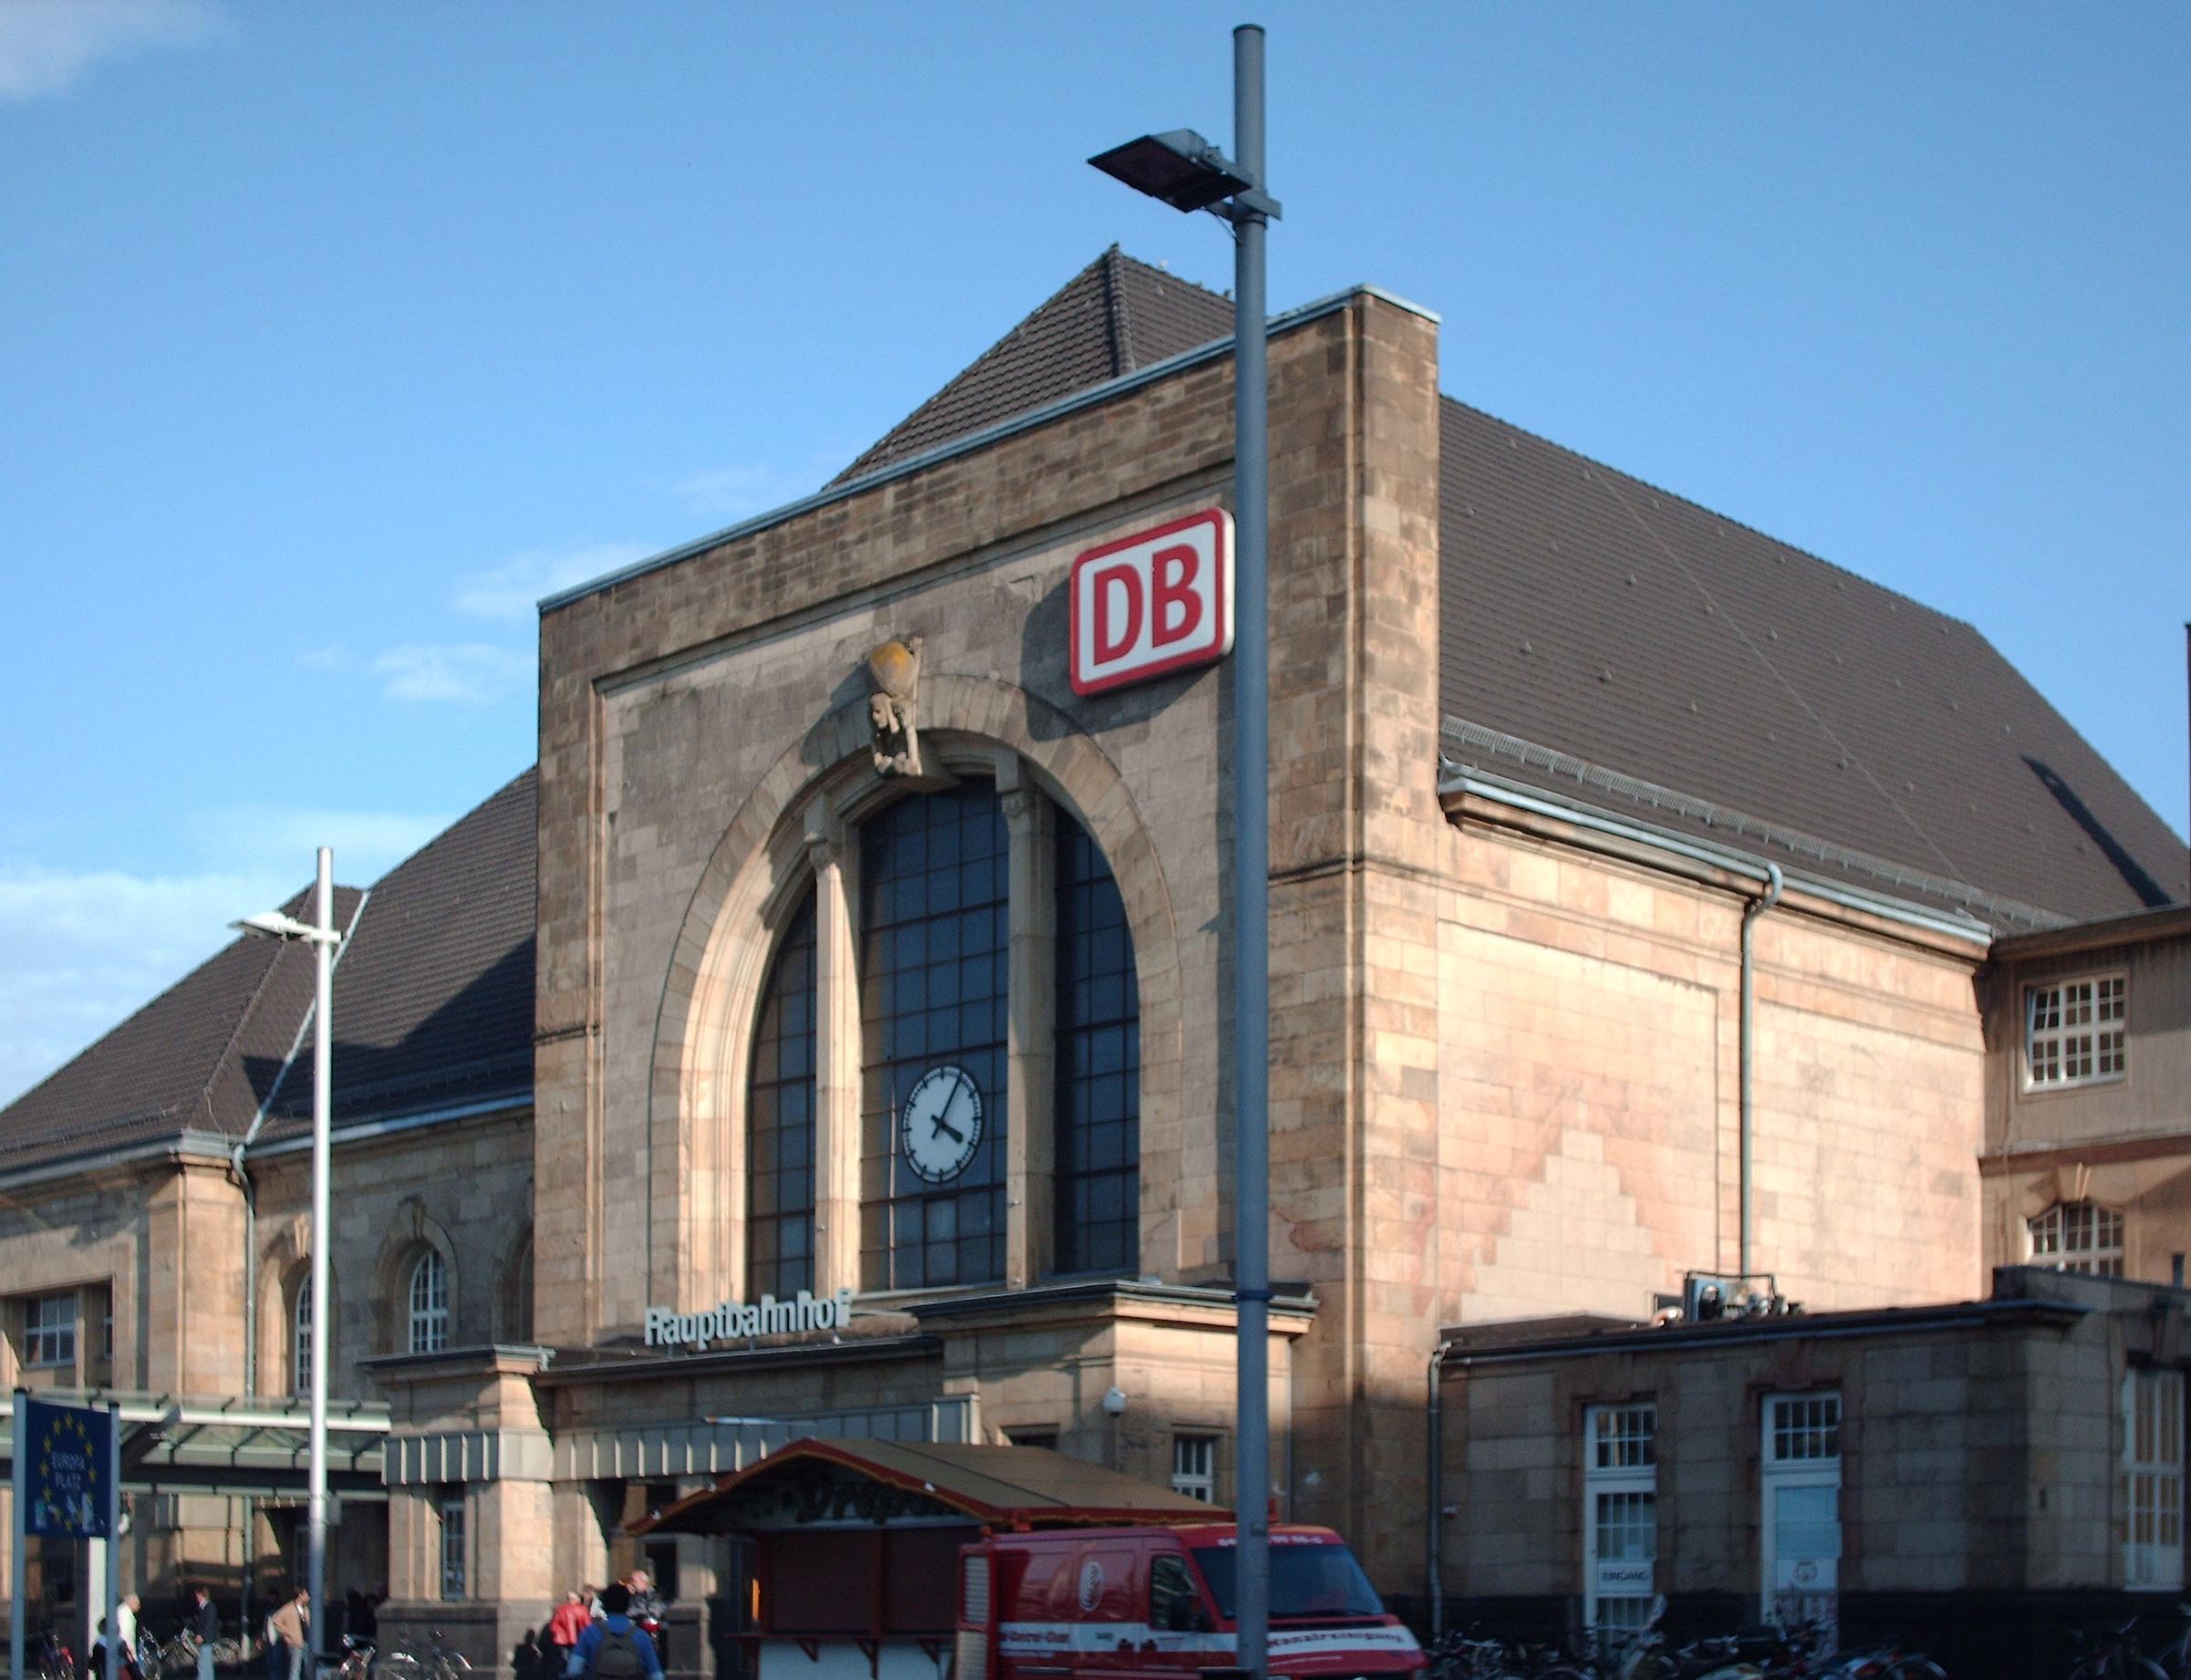 Aachen M Nchengladbach Railway Wiki Everipedia